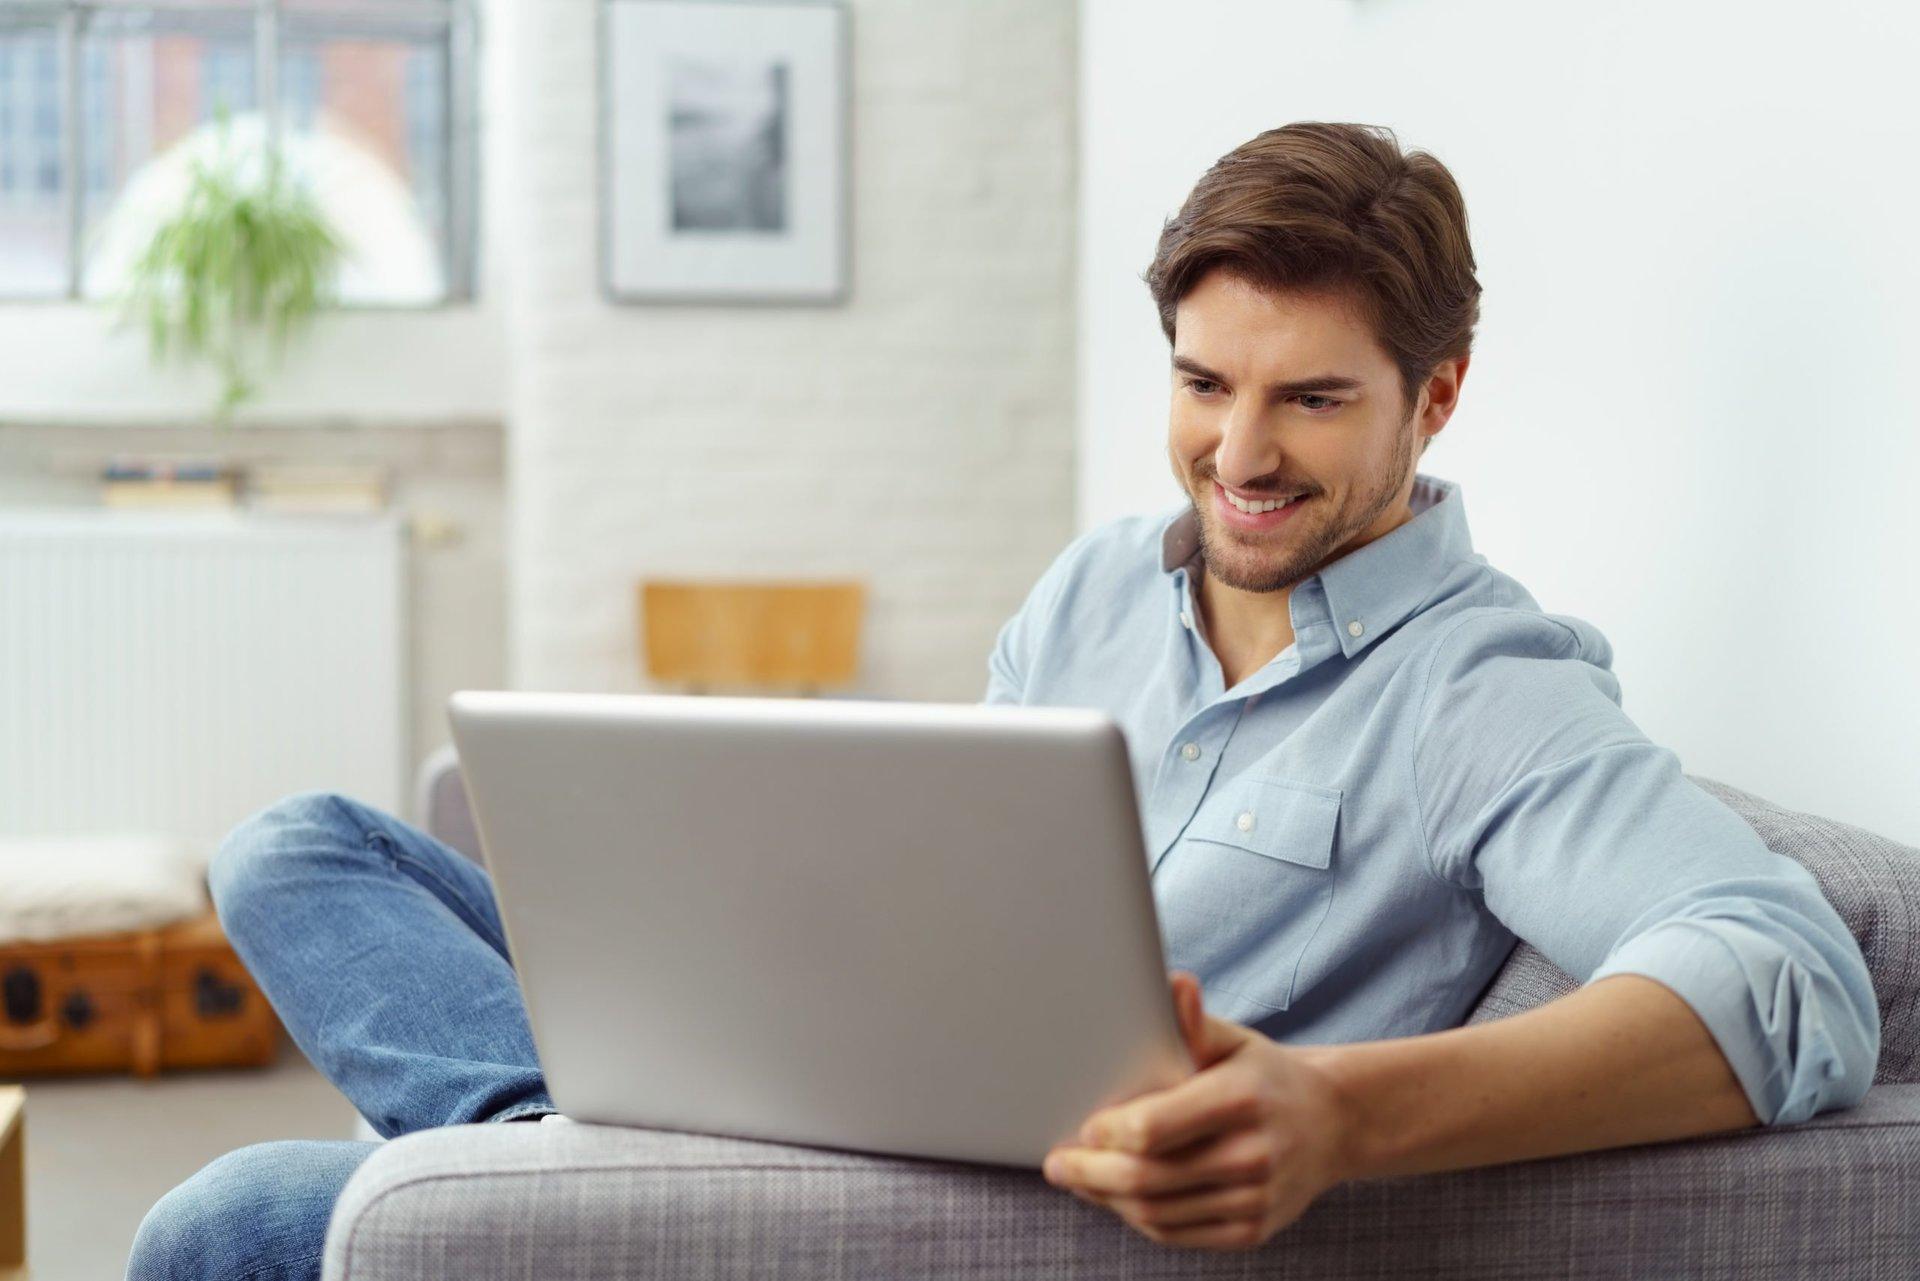 Man happily using laptop